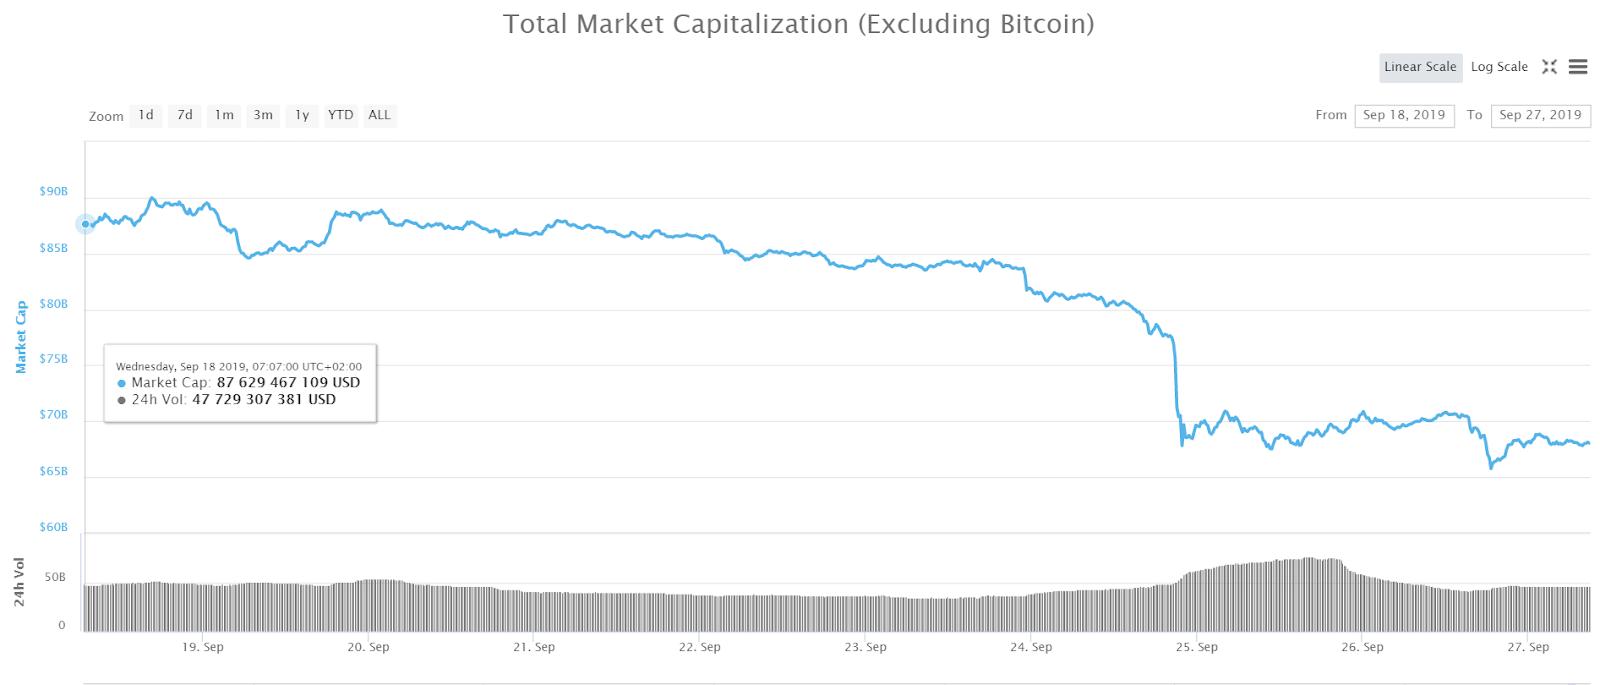 Krypto-Marktkapitalisierung ohne Bitcoin